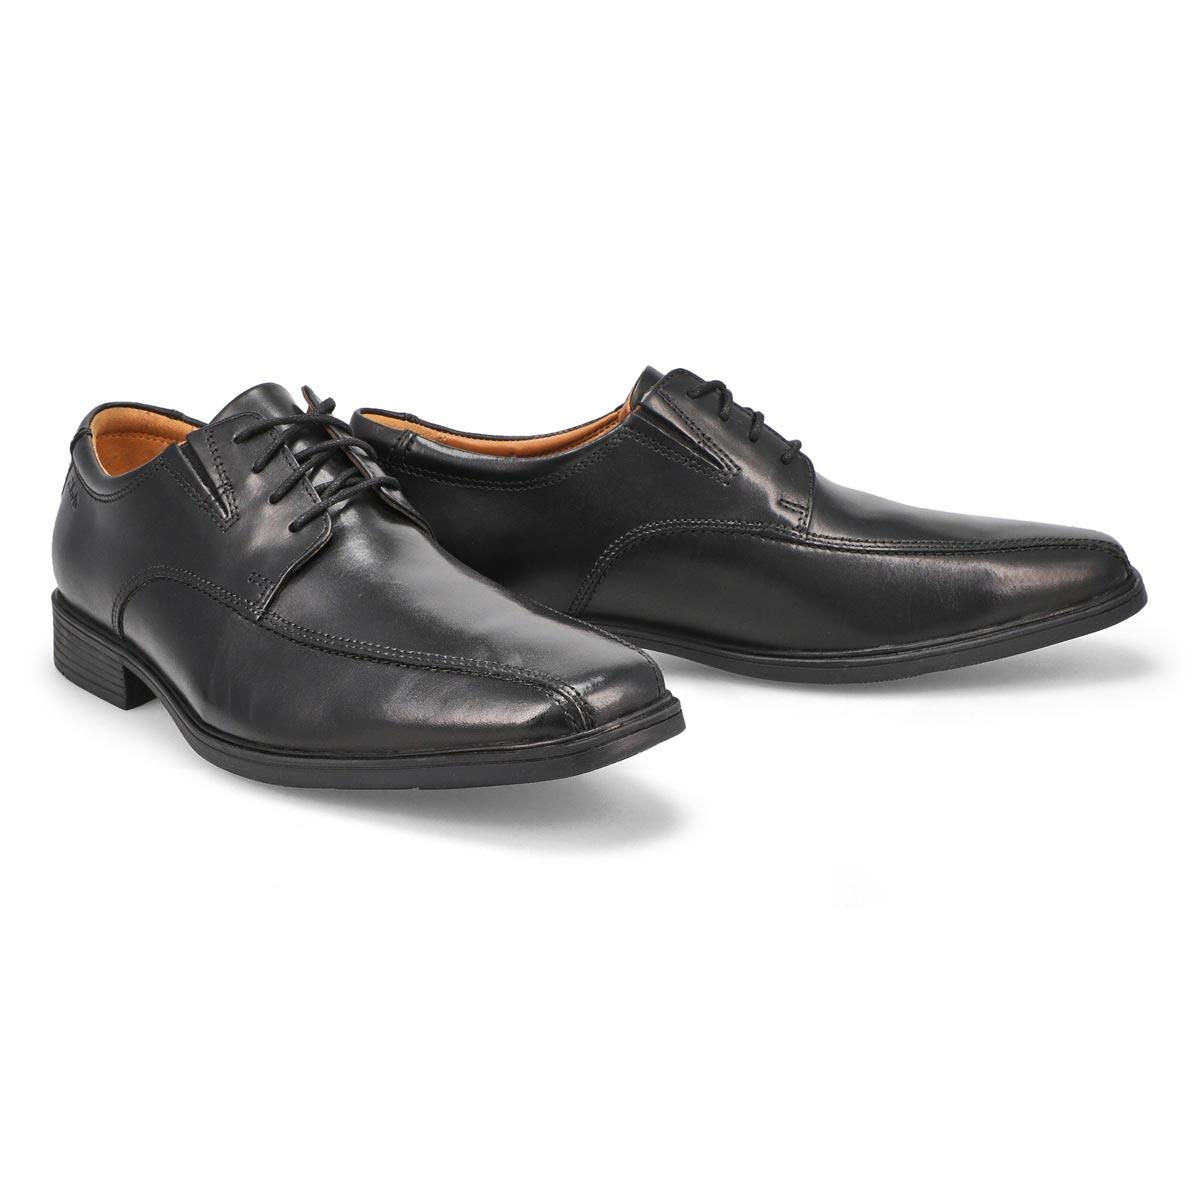 Richelieus habillés TILDEN WALK, noir, hommes